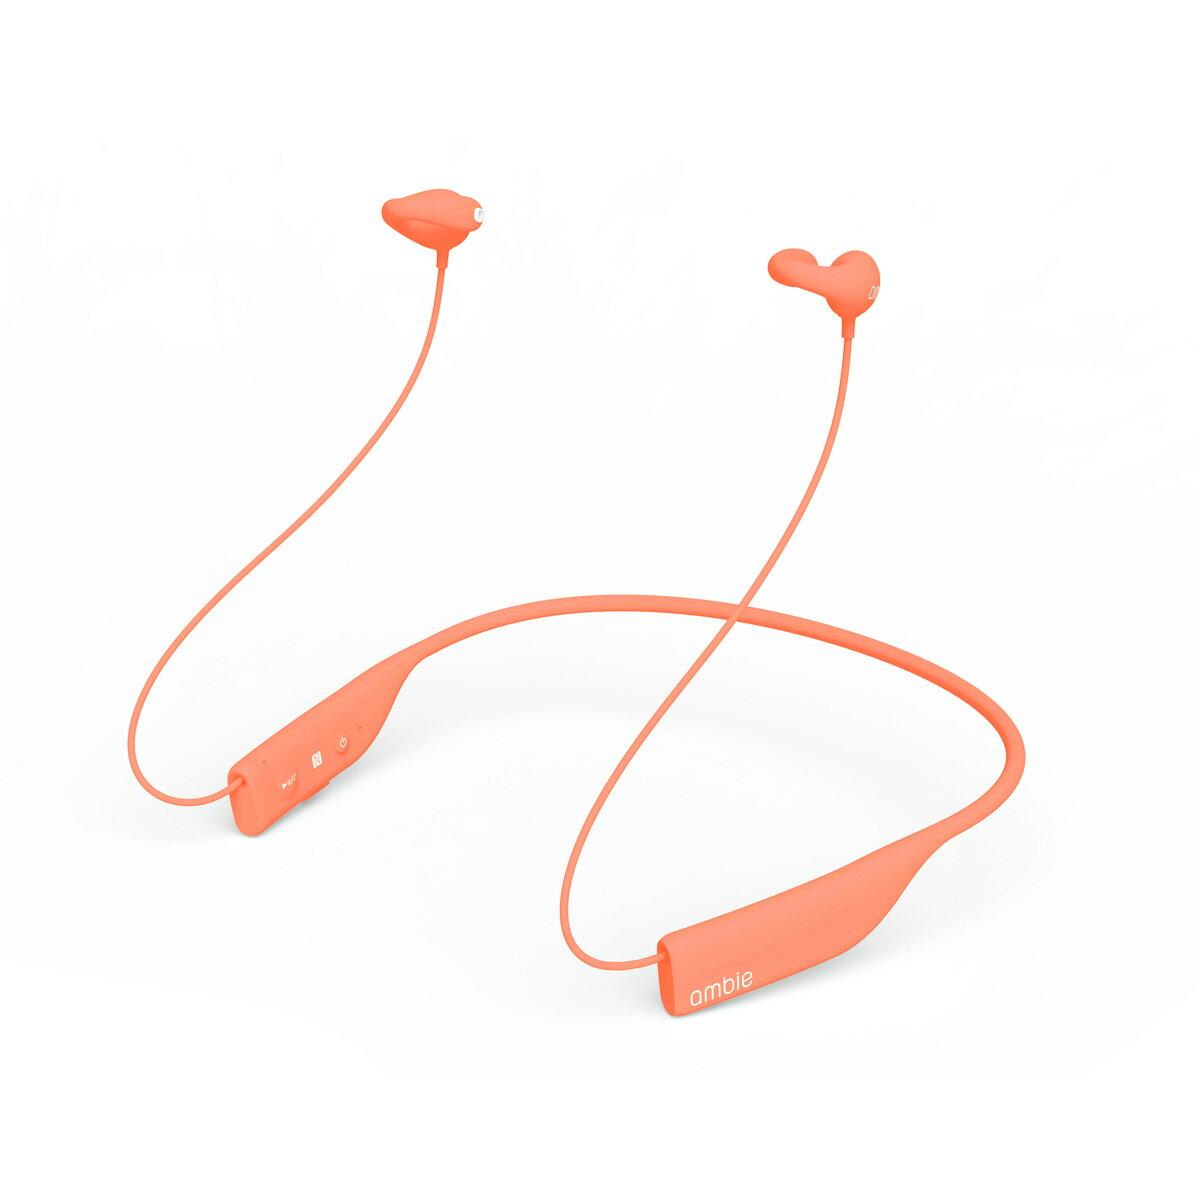 【ambie wireless earcuffs(アンビー ワイヤレスイヤカフ)/Stamp Orange】最新モデル Bluetooth イヤホン 高音質 ワイヤレスイヤホン Bluetooth 4.1 ランニング ブルートゥース イヤホン bluetooth ながら聴き 耳にいれない 送料無料